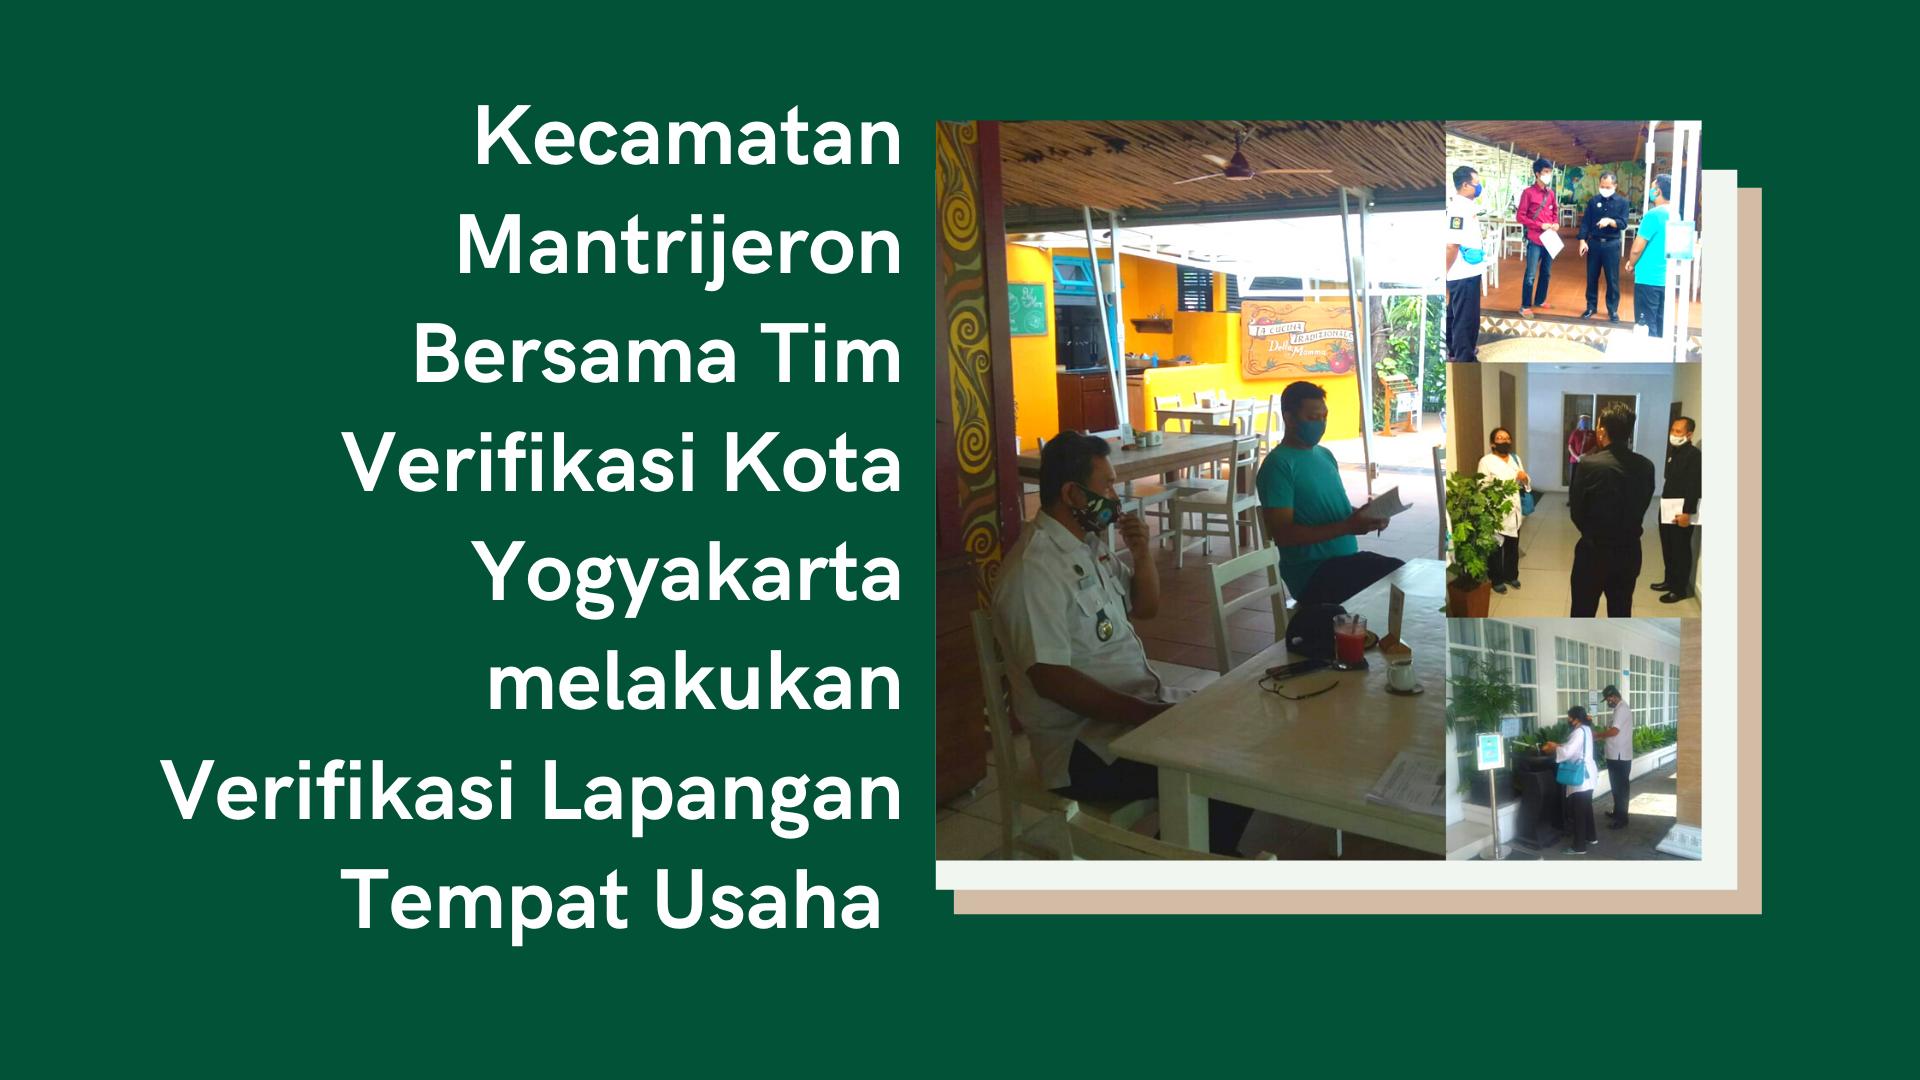 Kecamatan Mantrijeron Bersama Tim Verifikasi Kota Yogyakarta melakukan Verifikasi Lapangan Tempat Usaha